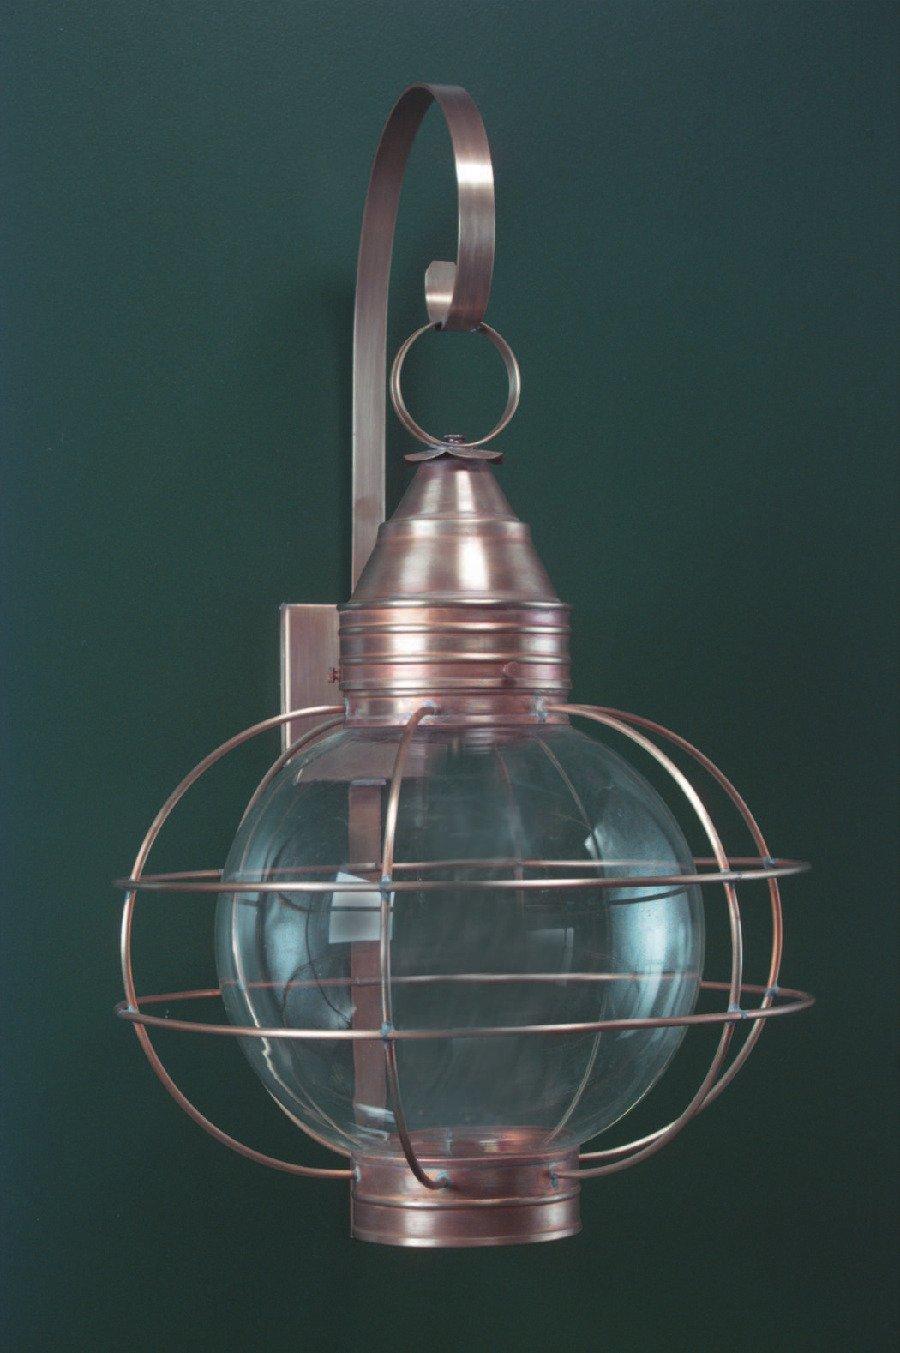 Antique Colonial Onion Wall Light RG12